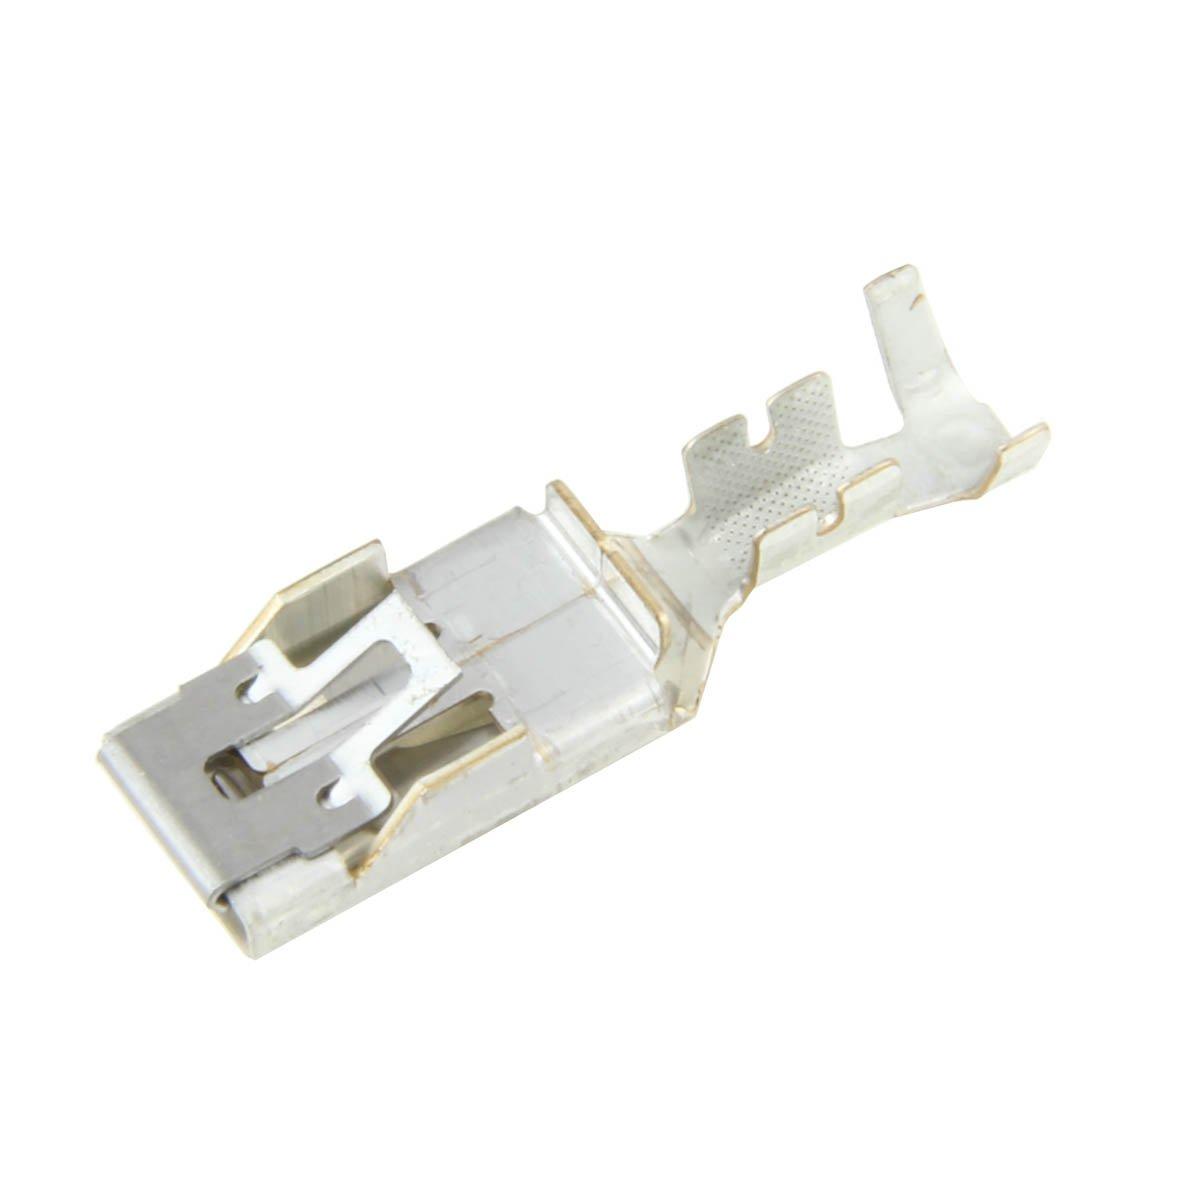 800 Series Pack of 5 Unsealed #12092444 - Female Metri-Pack Terminals